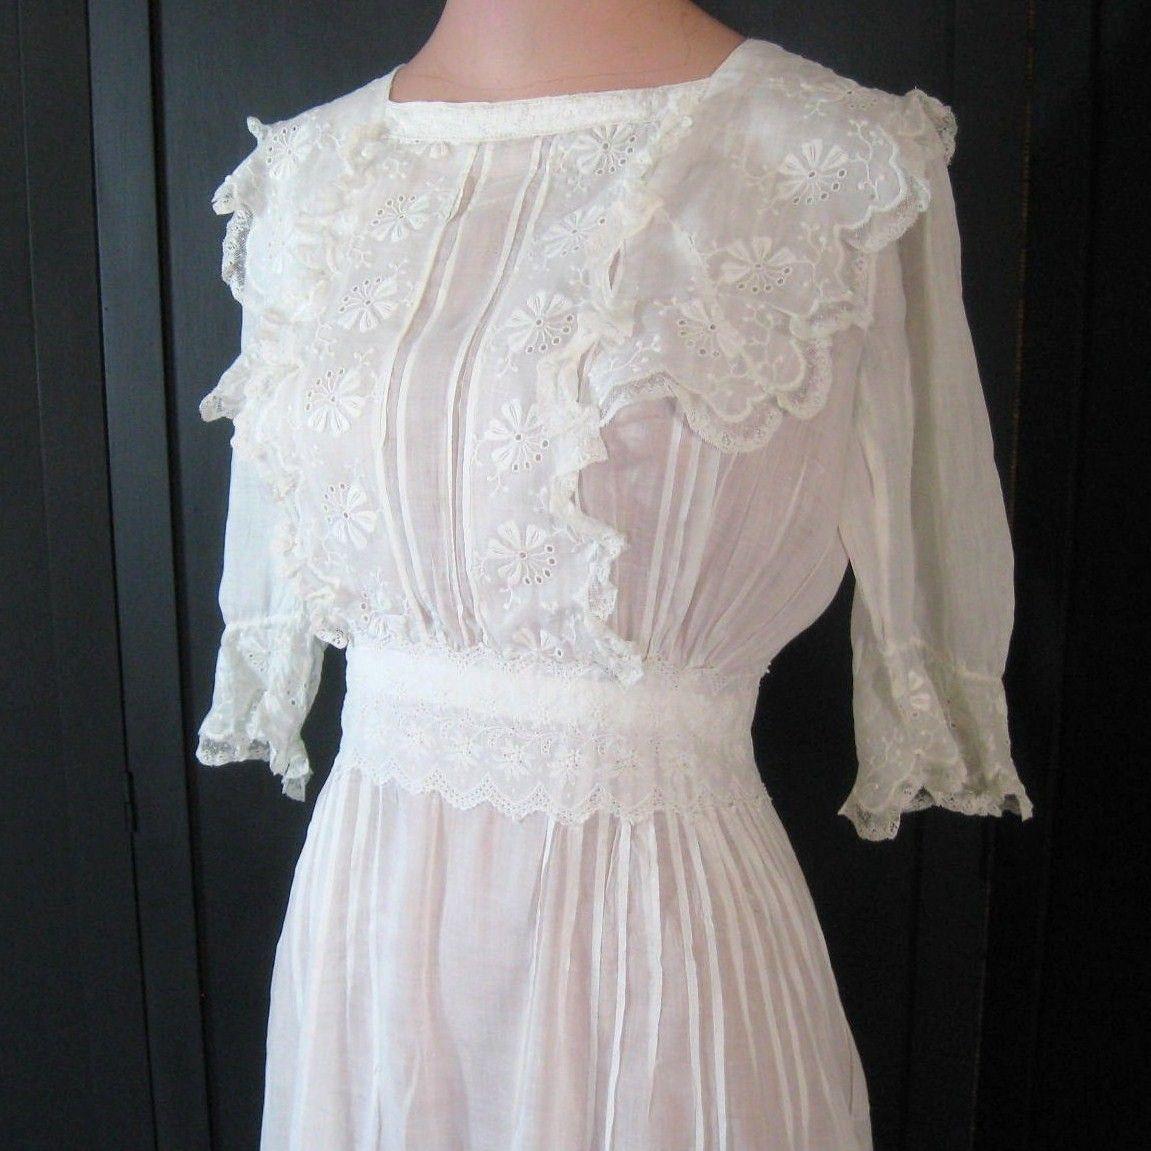 Vintage Antique Edwardian Dress White Sheer Cotton Tiered